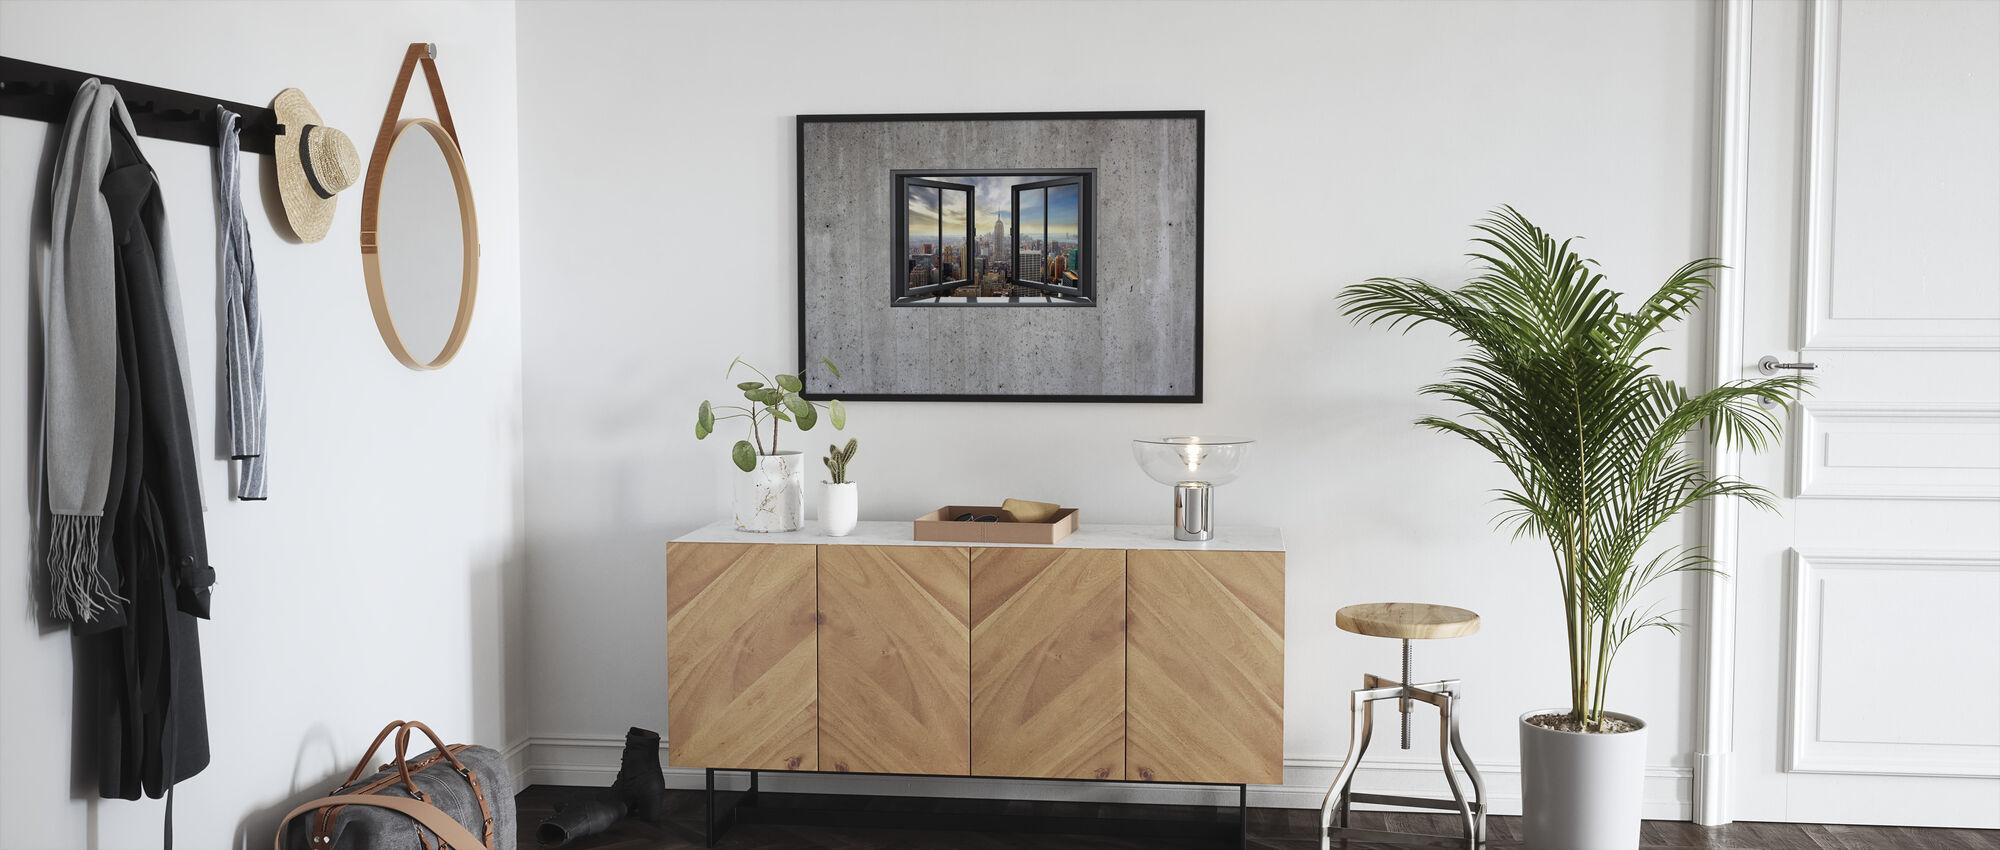 New York Through Window - Concrete Wall - Framed print - Hallway